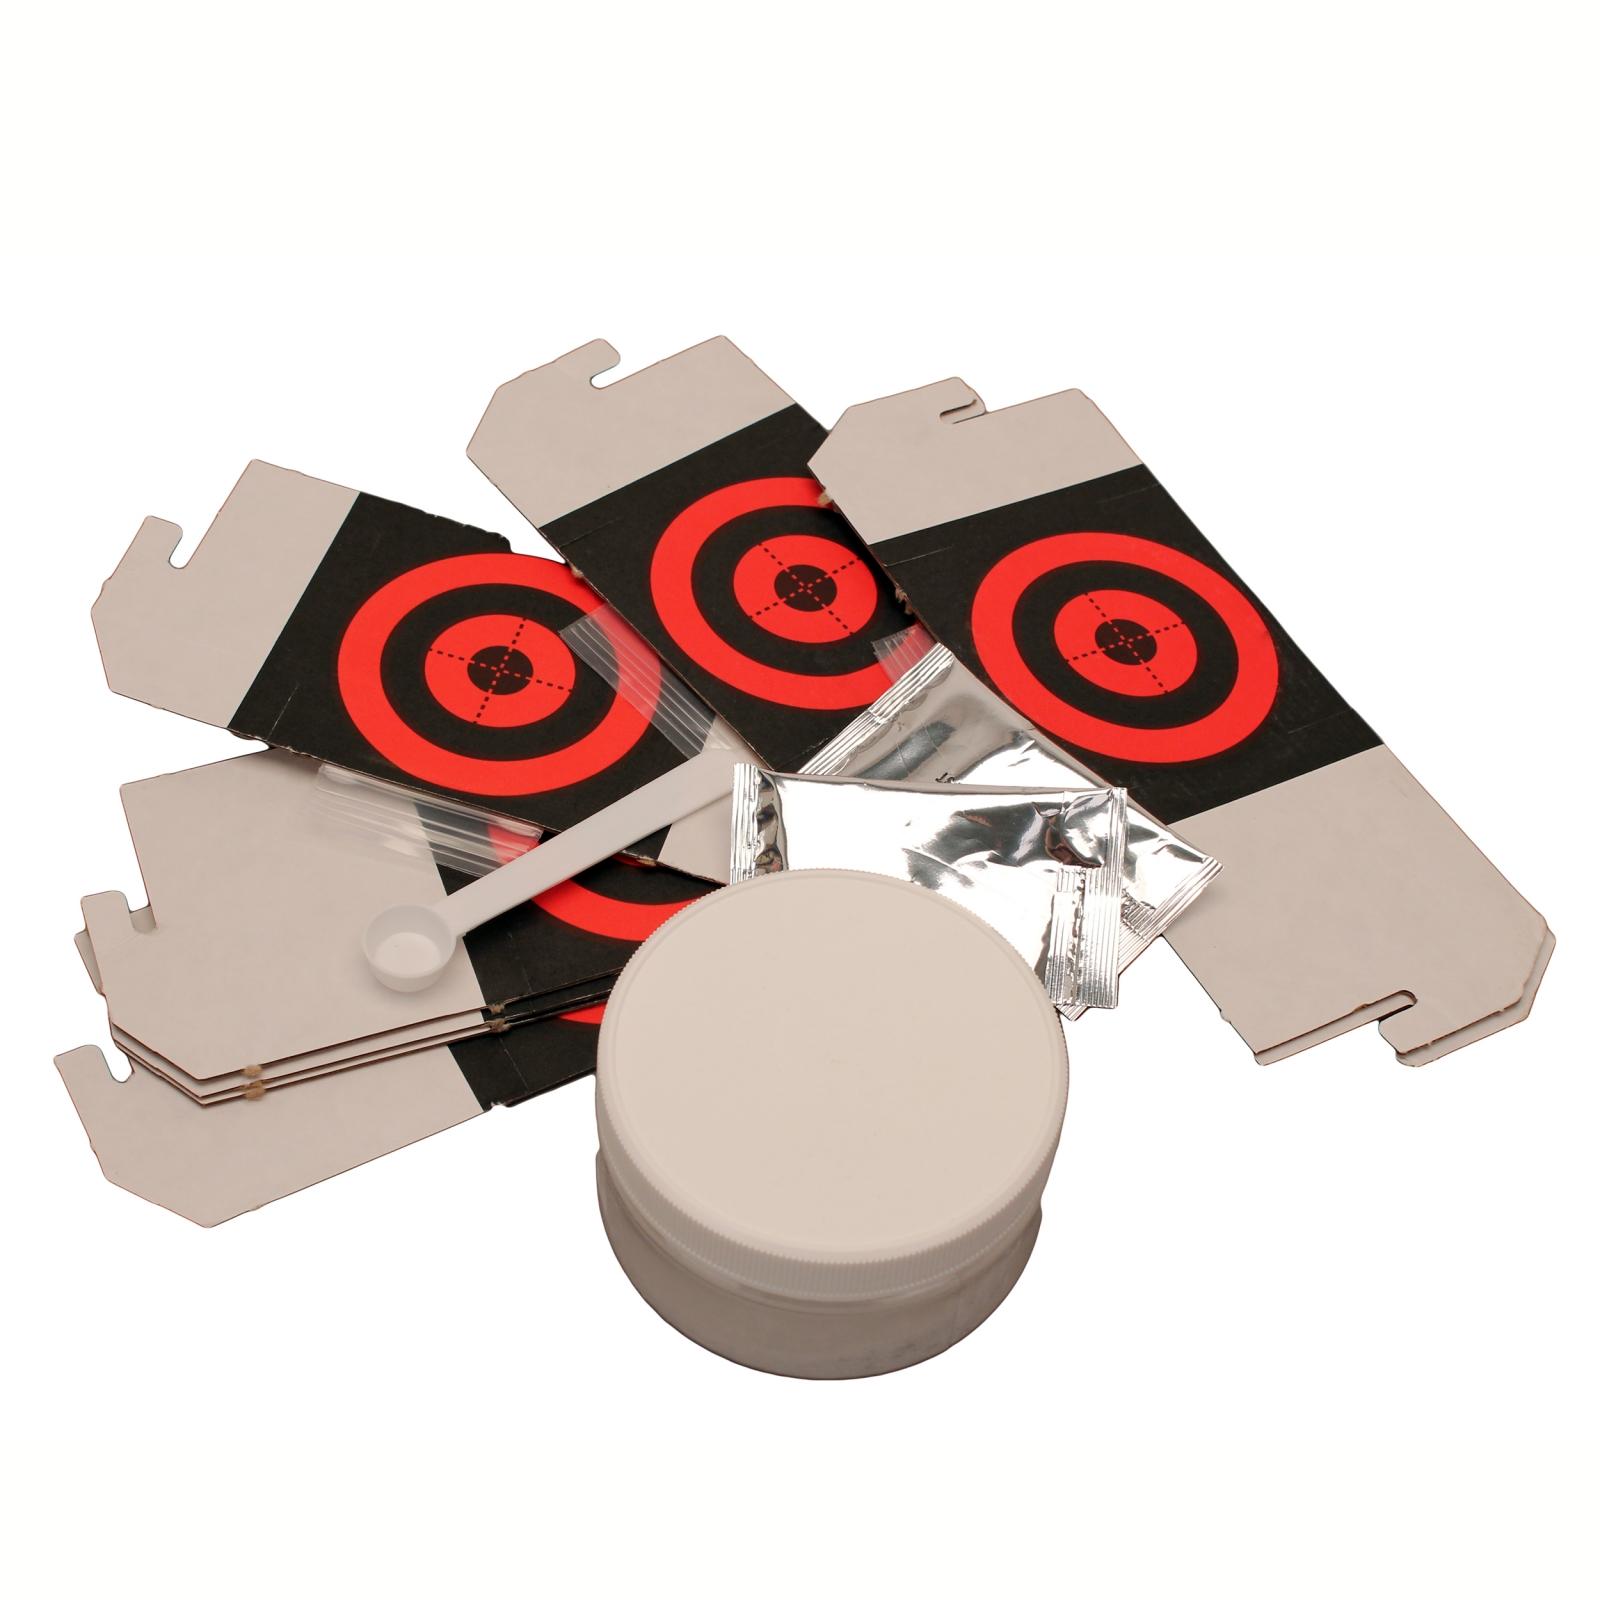 Goliath Rimfire Exploding Target 8 Pack